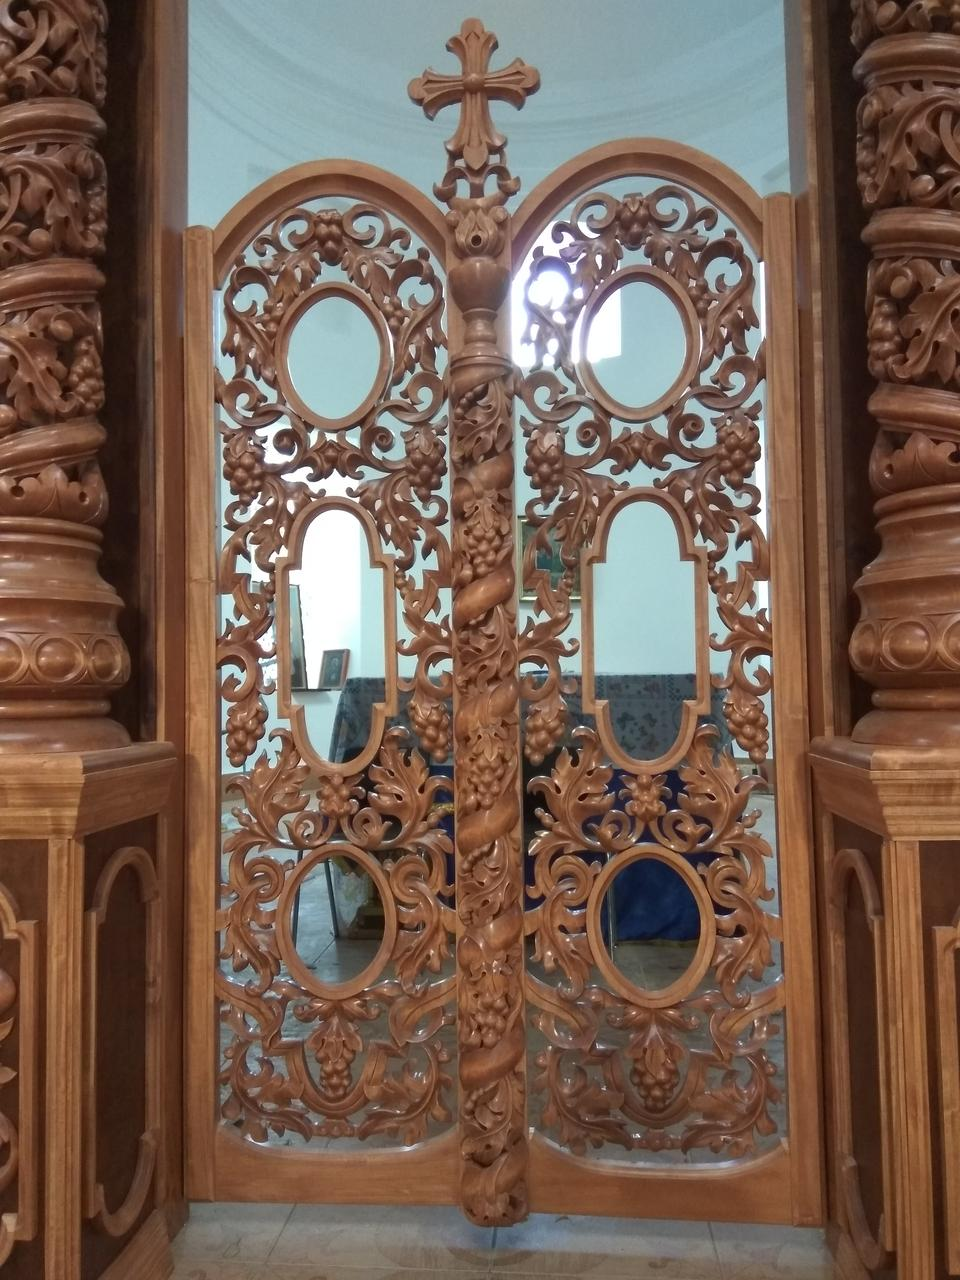 Царские врата  из дерева,Барокко,220/120/65